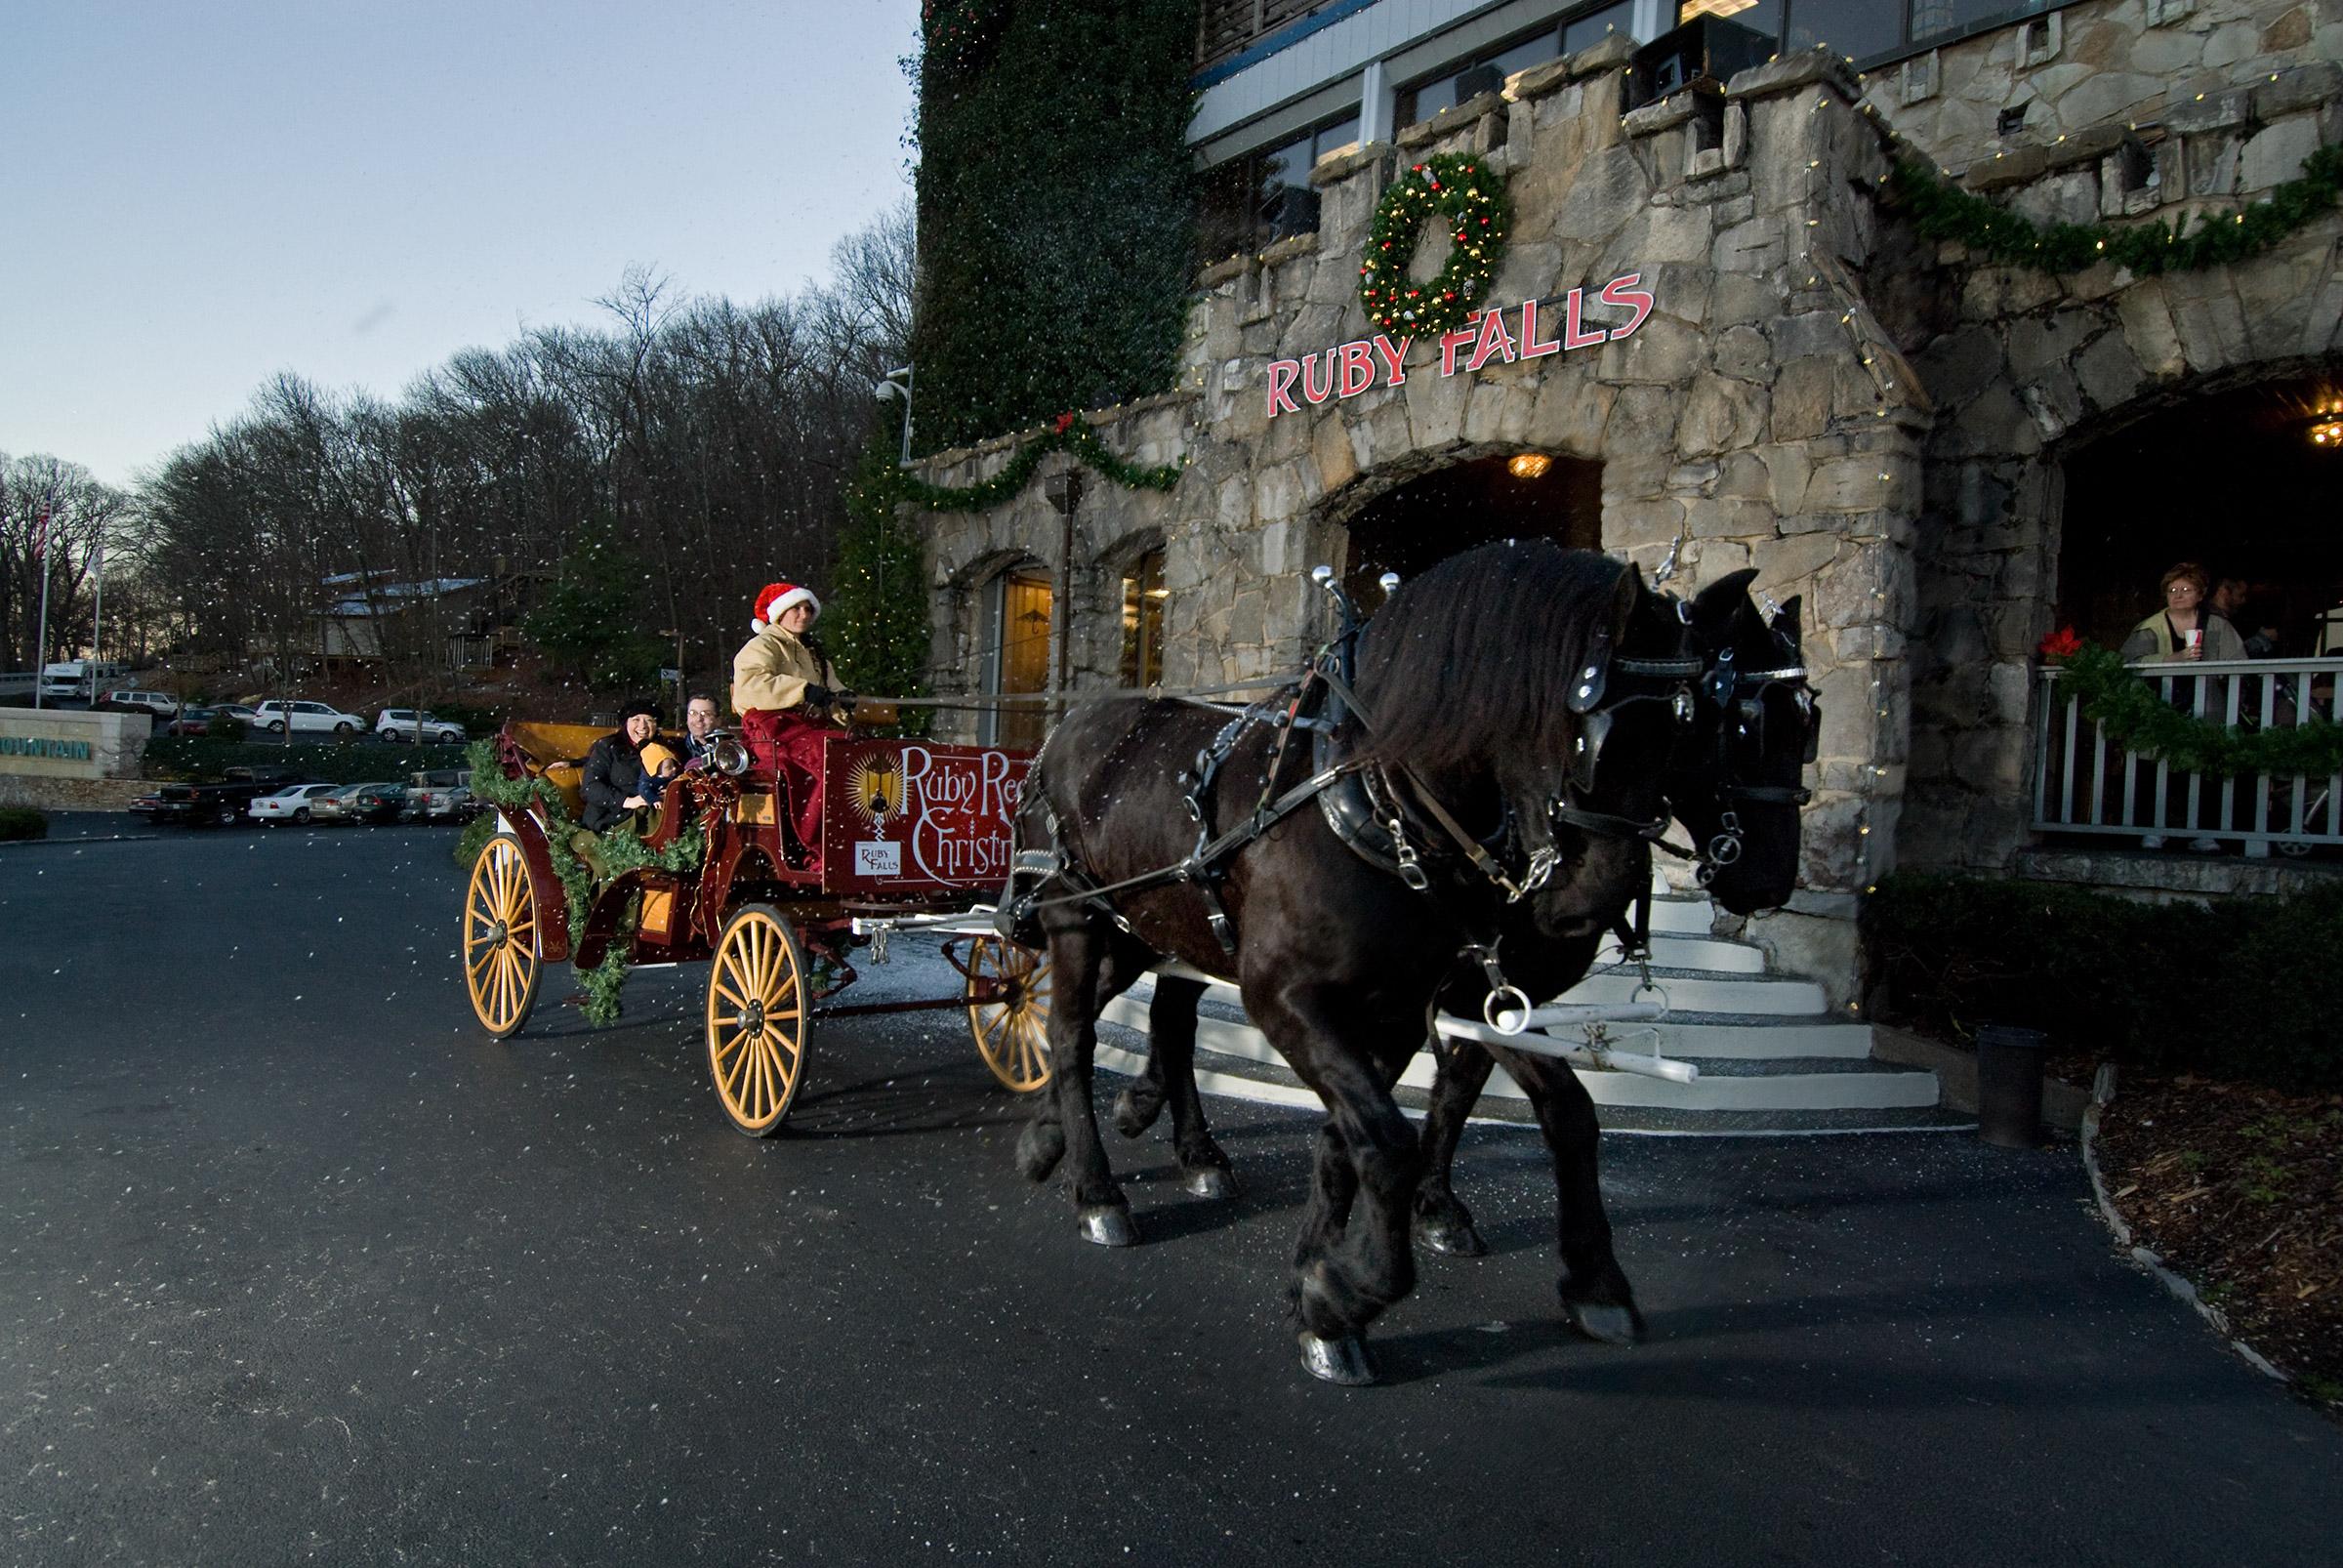 Ruby Falls' Christmas Underground through December 23rd!